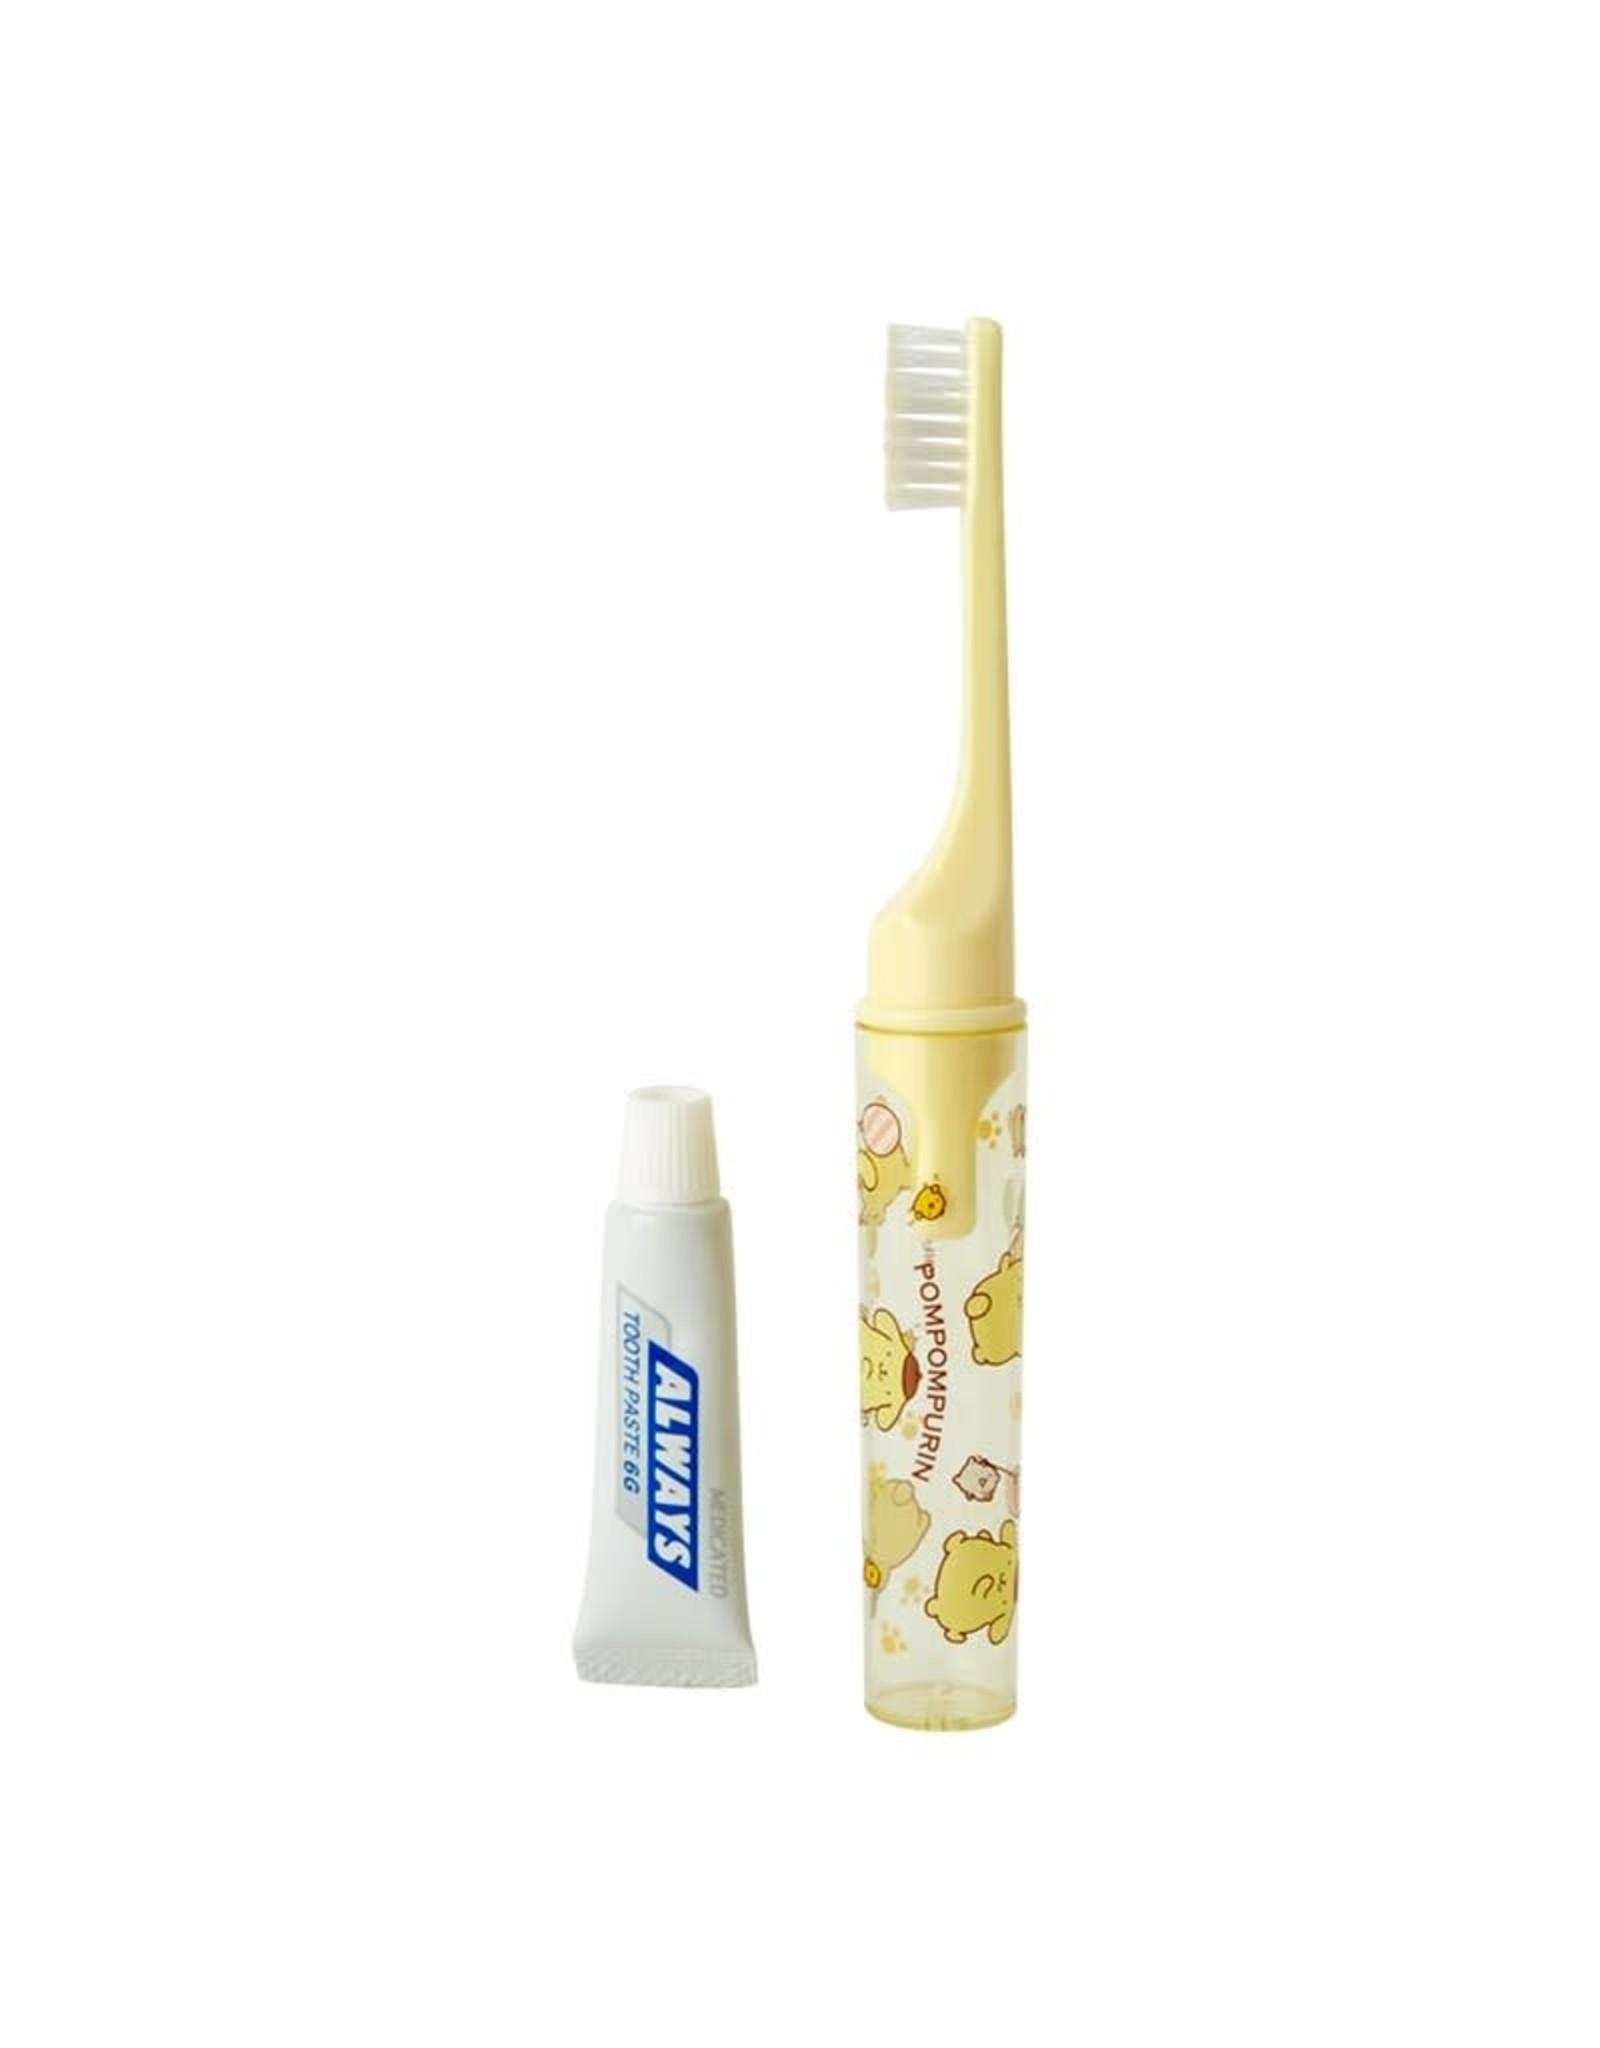 Sanrio Sanrio Travel Toothbrush Set